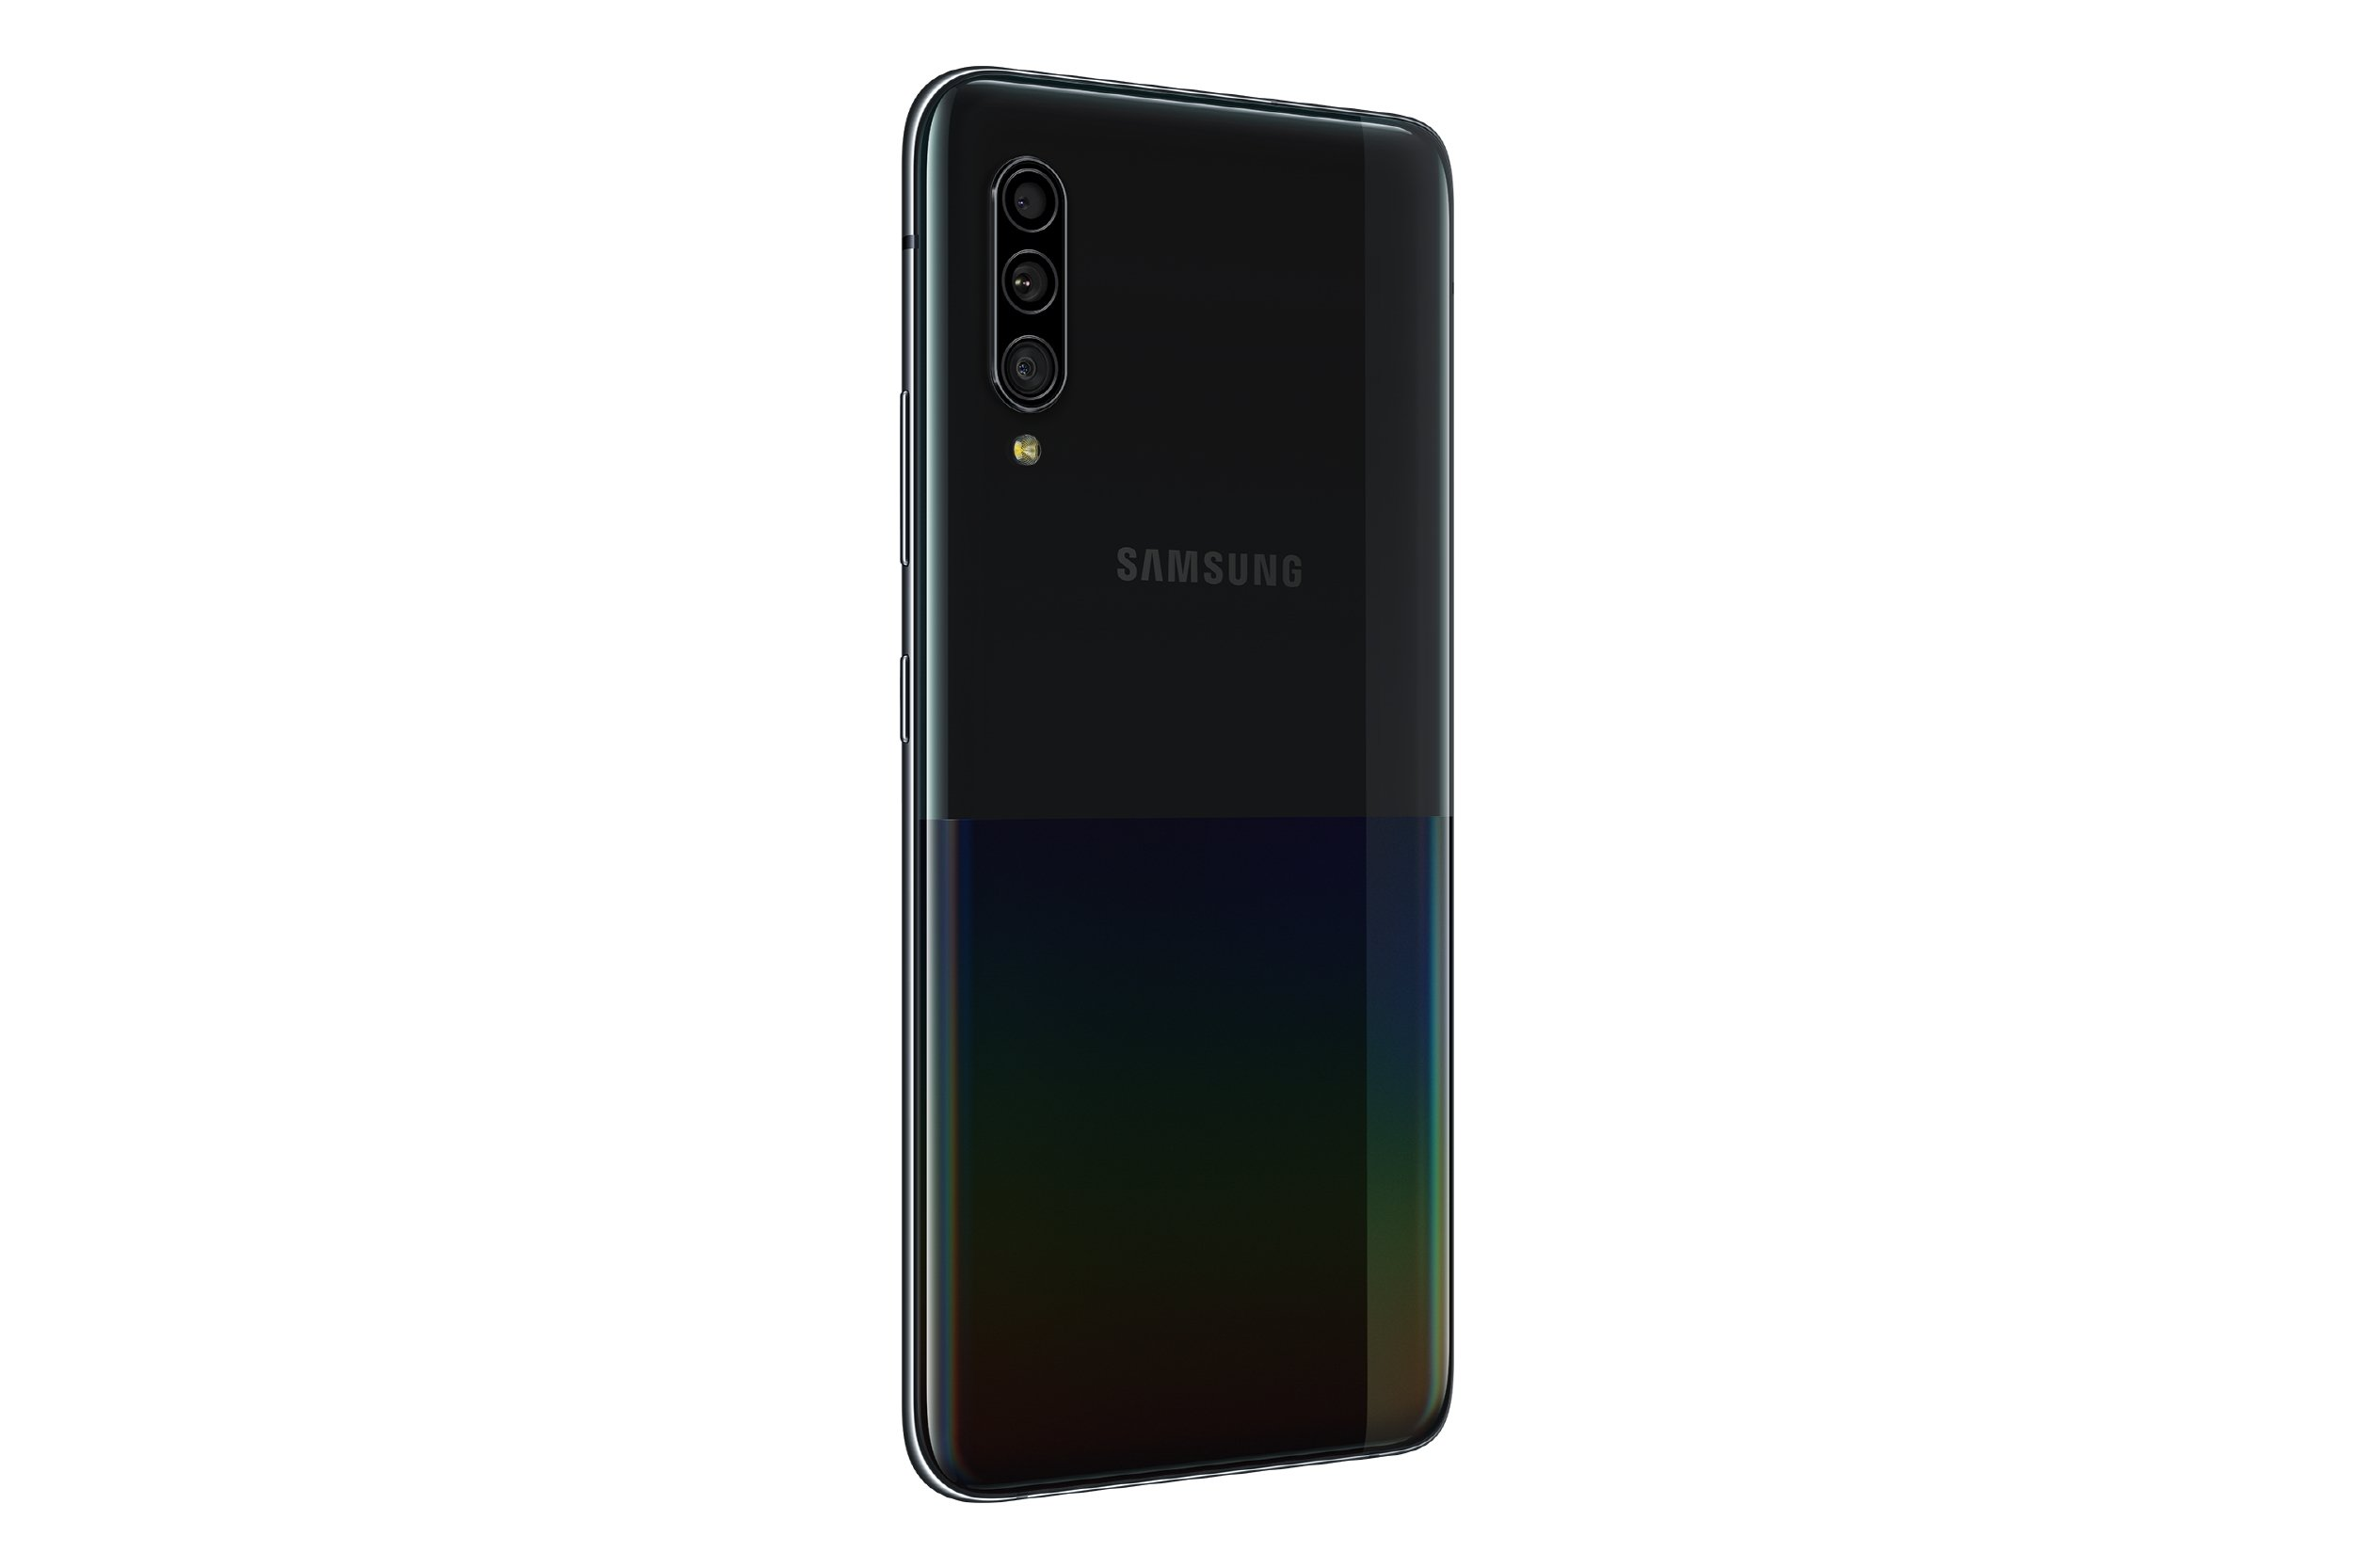 Samsung lancera vendredi son téléphone pliable